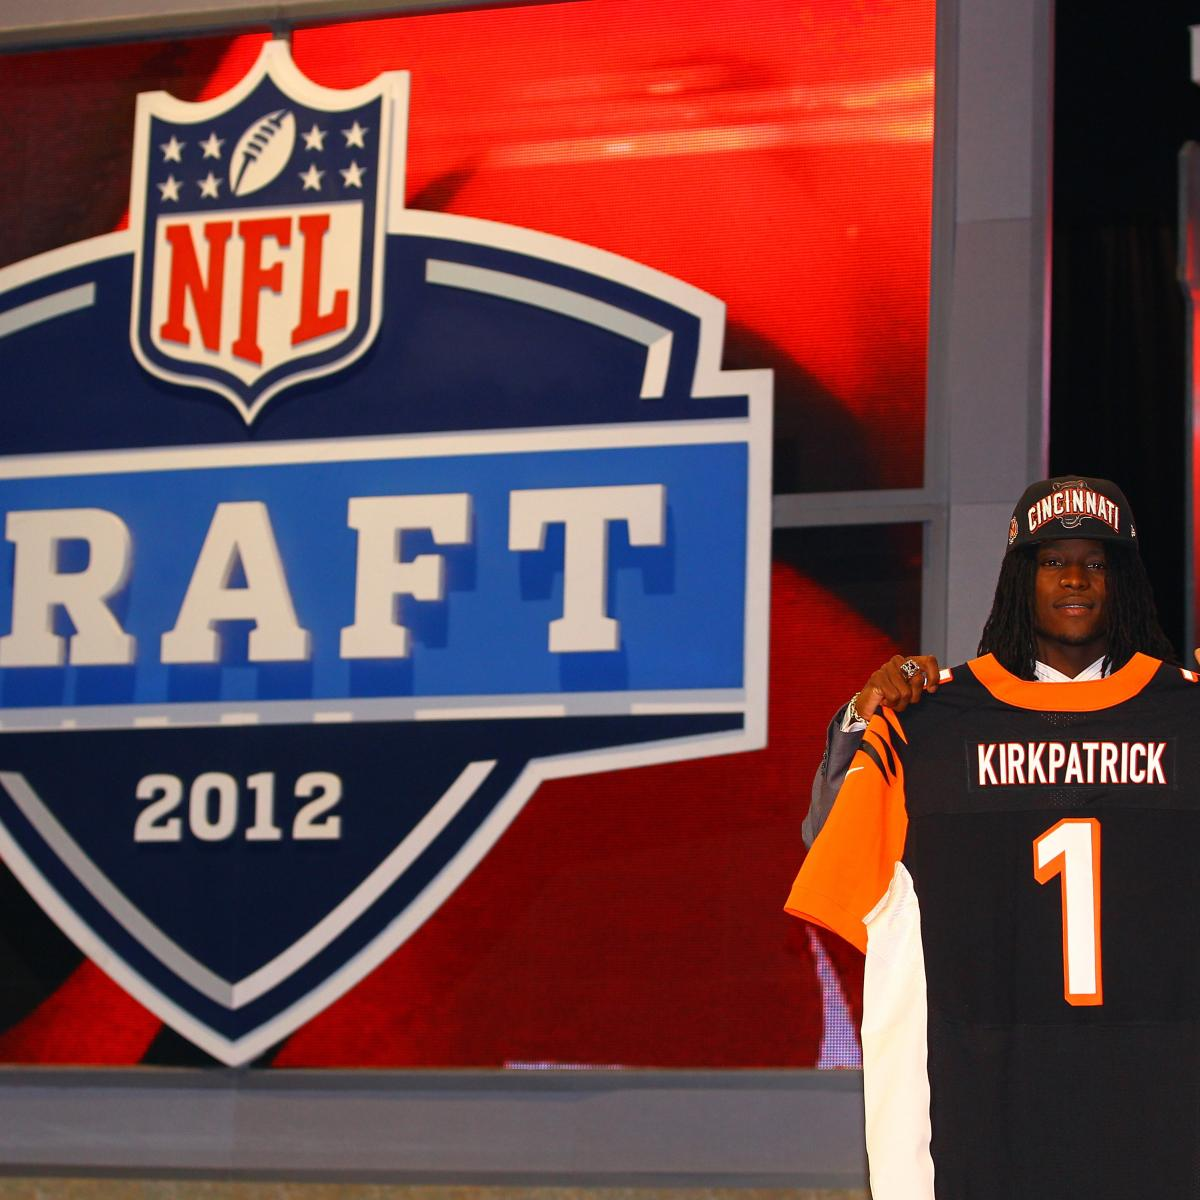 Latest News Updates: Cincinnati Bengals 2013 Draft Updates: Latest News, Trade